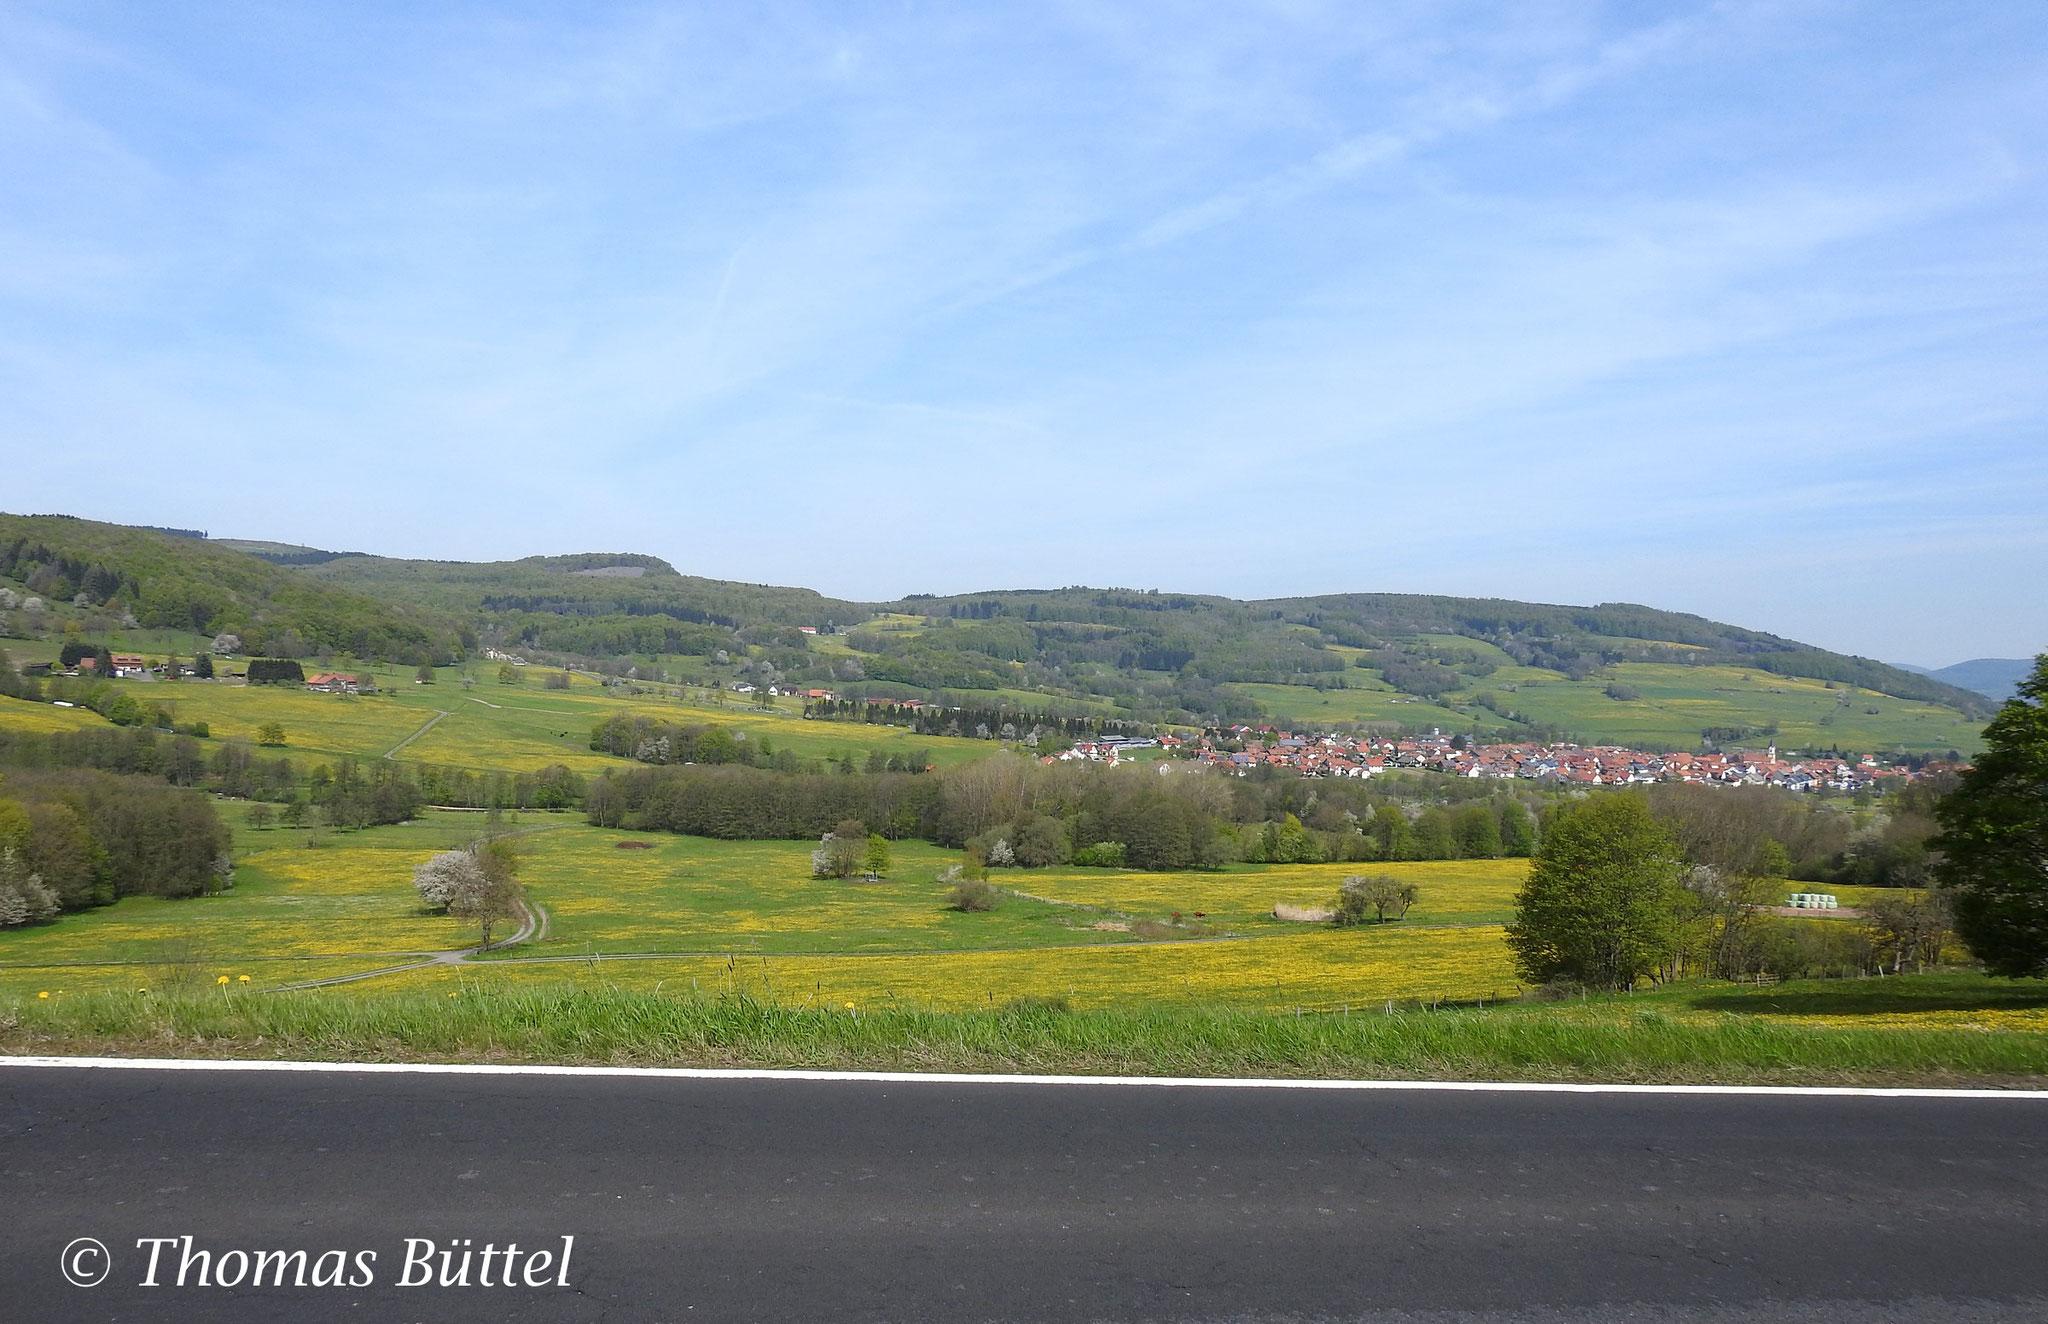 landscape beyond the street